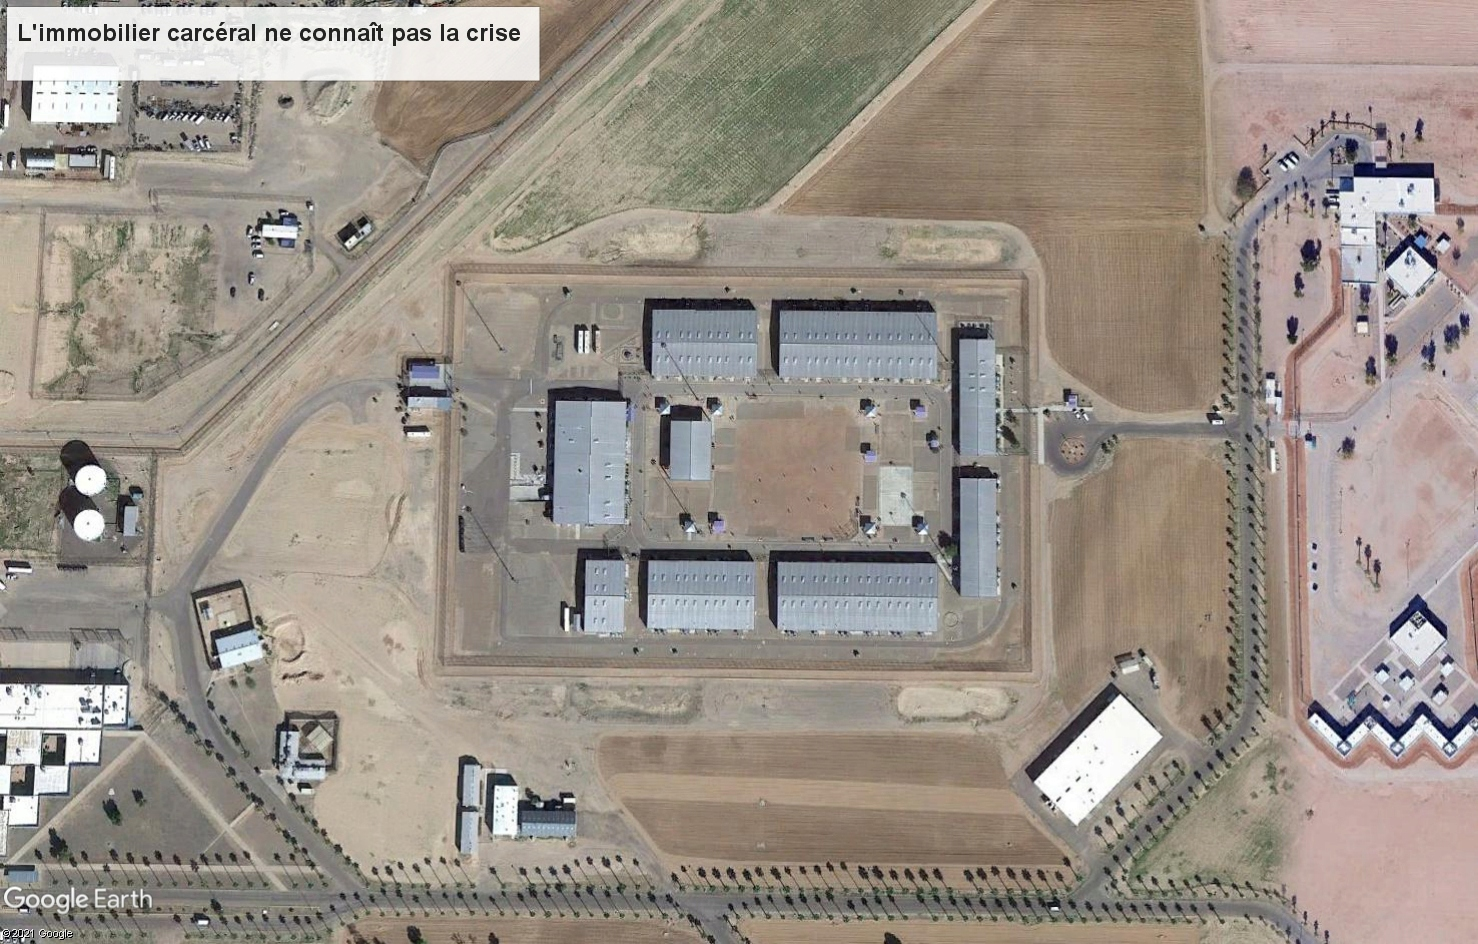 Si t'es pas sage, t'iras en prison... Perryville, Arizona Tsge2074